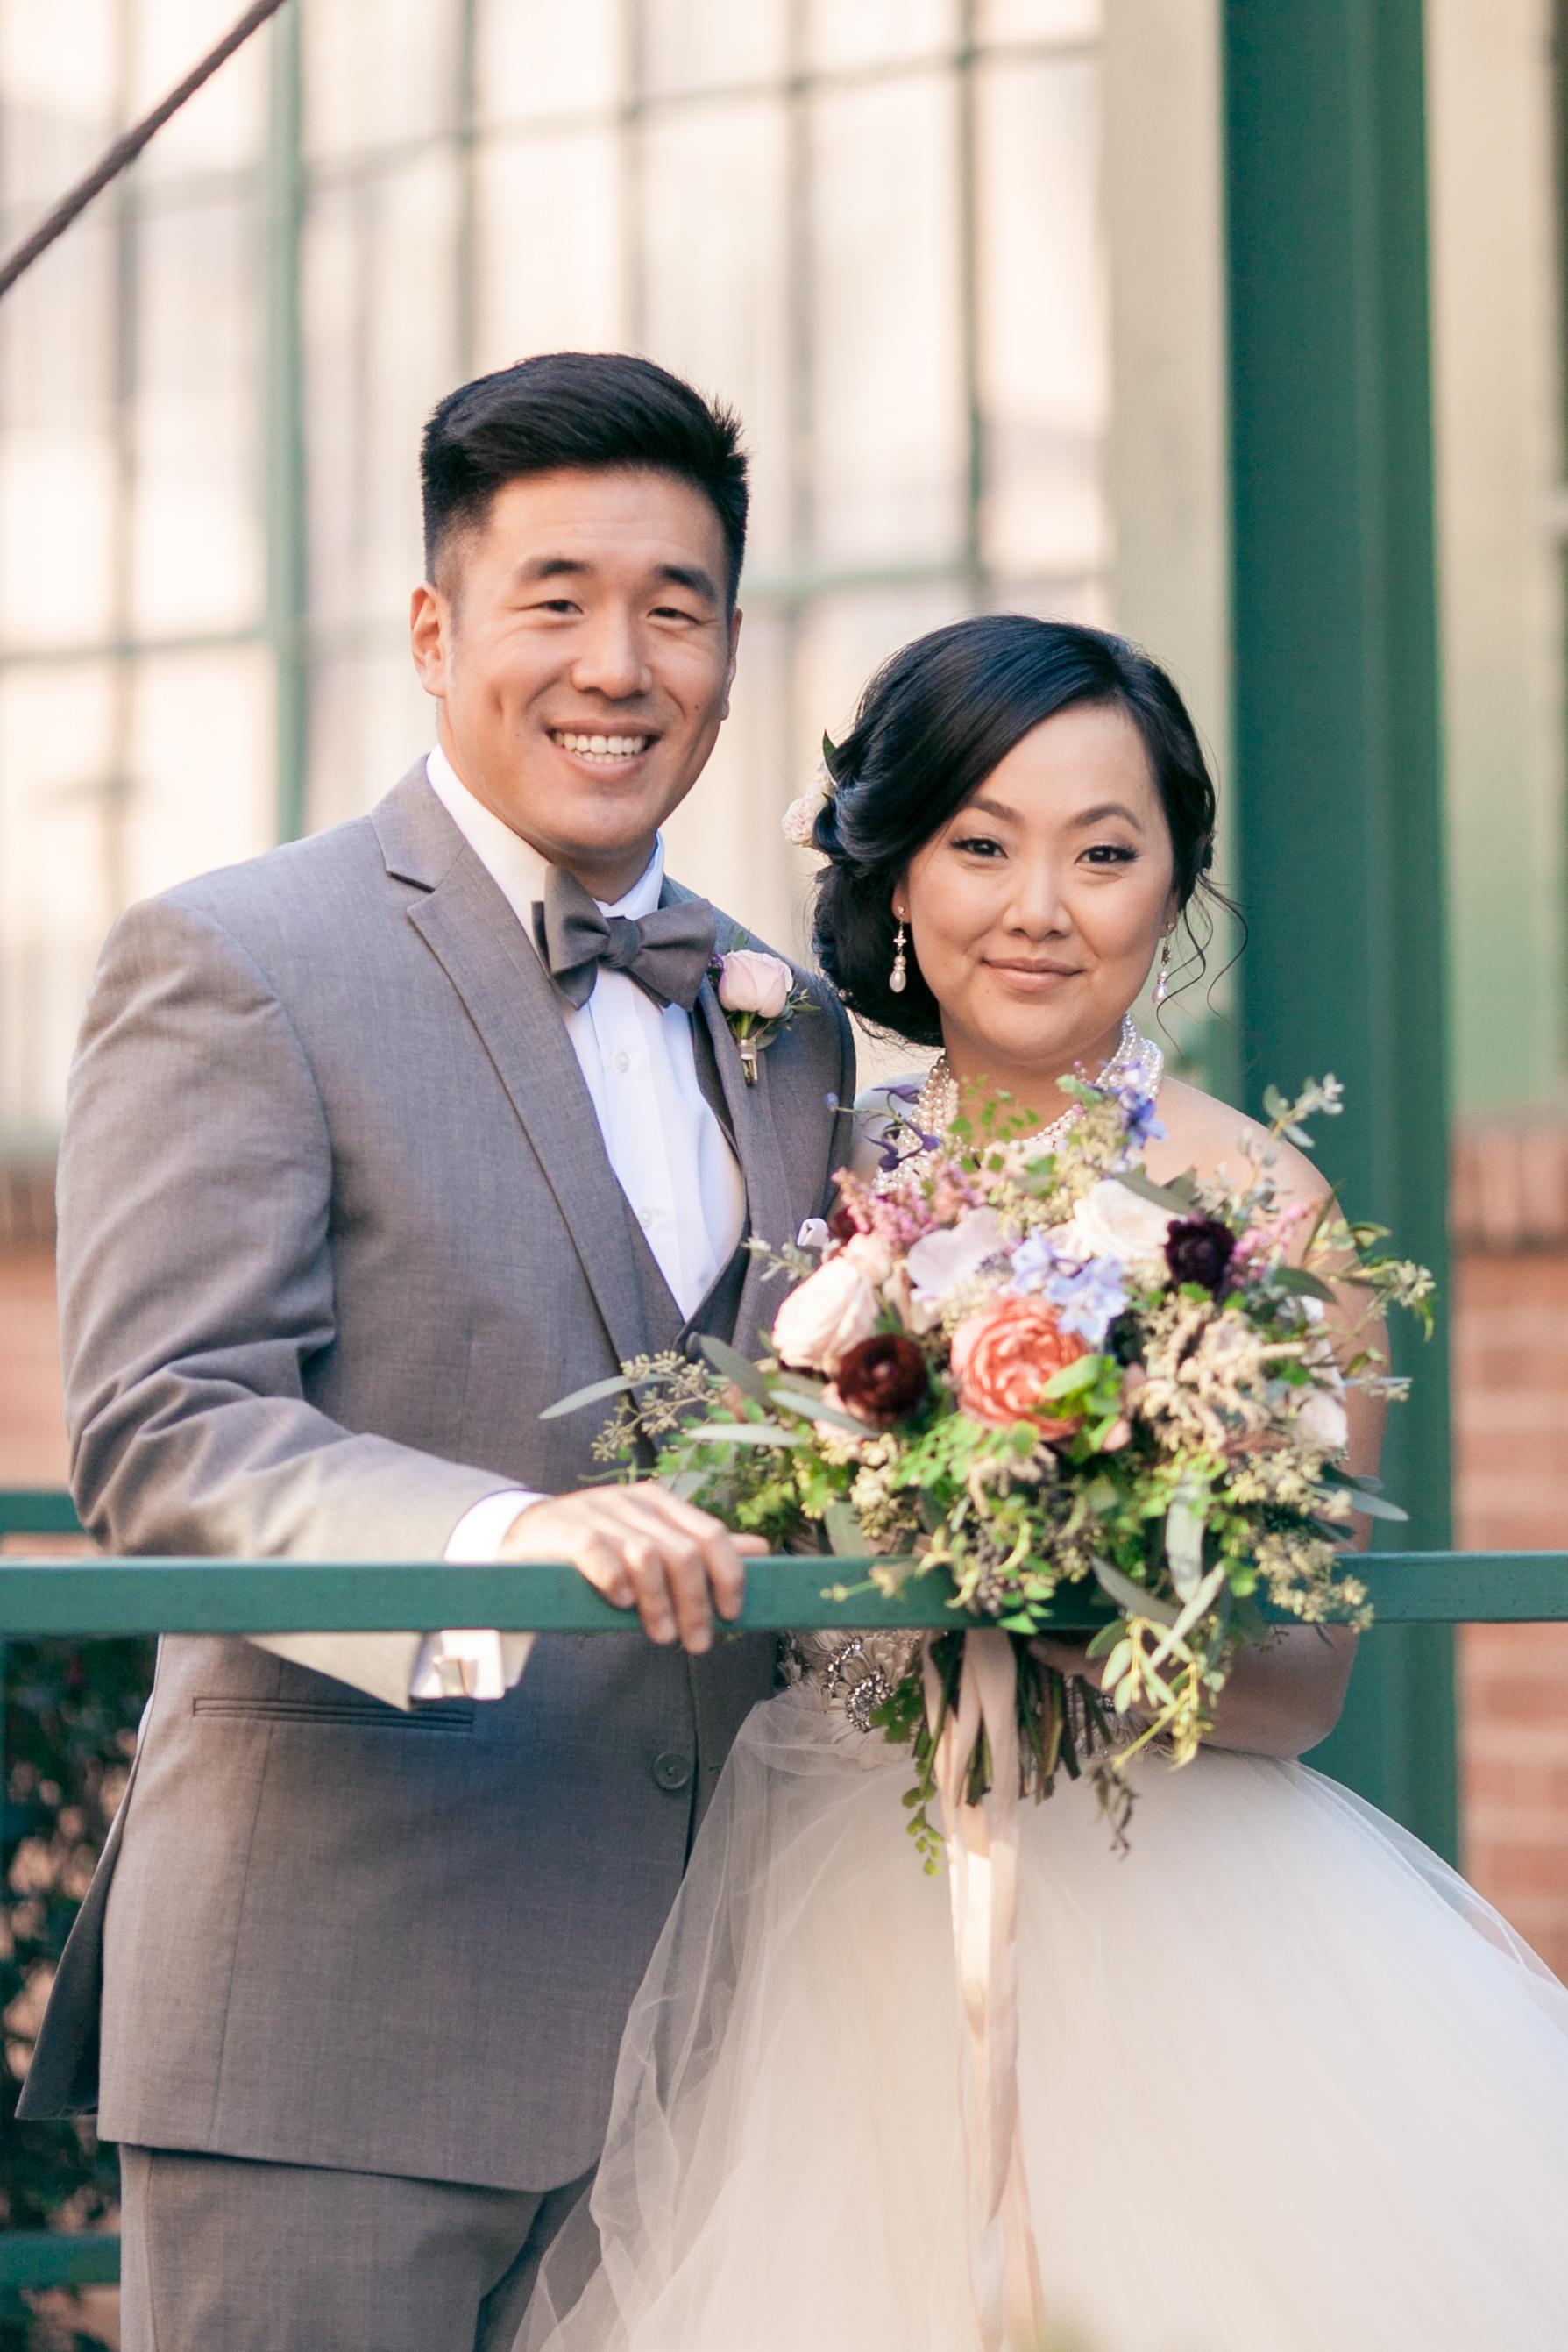 Industrial Bridal Portaits at King Plow Atlanta // Organic Floral Design